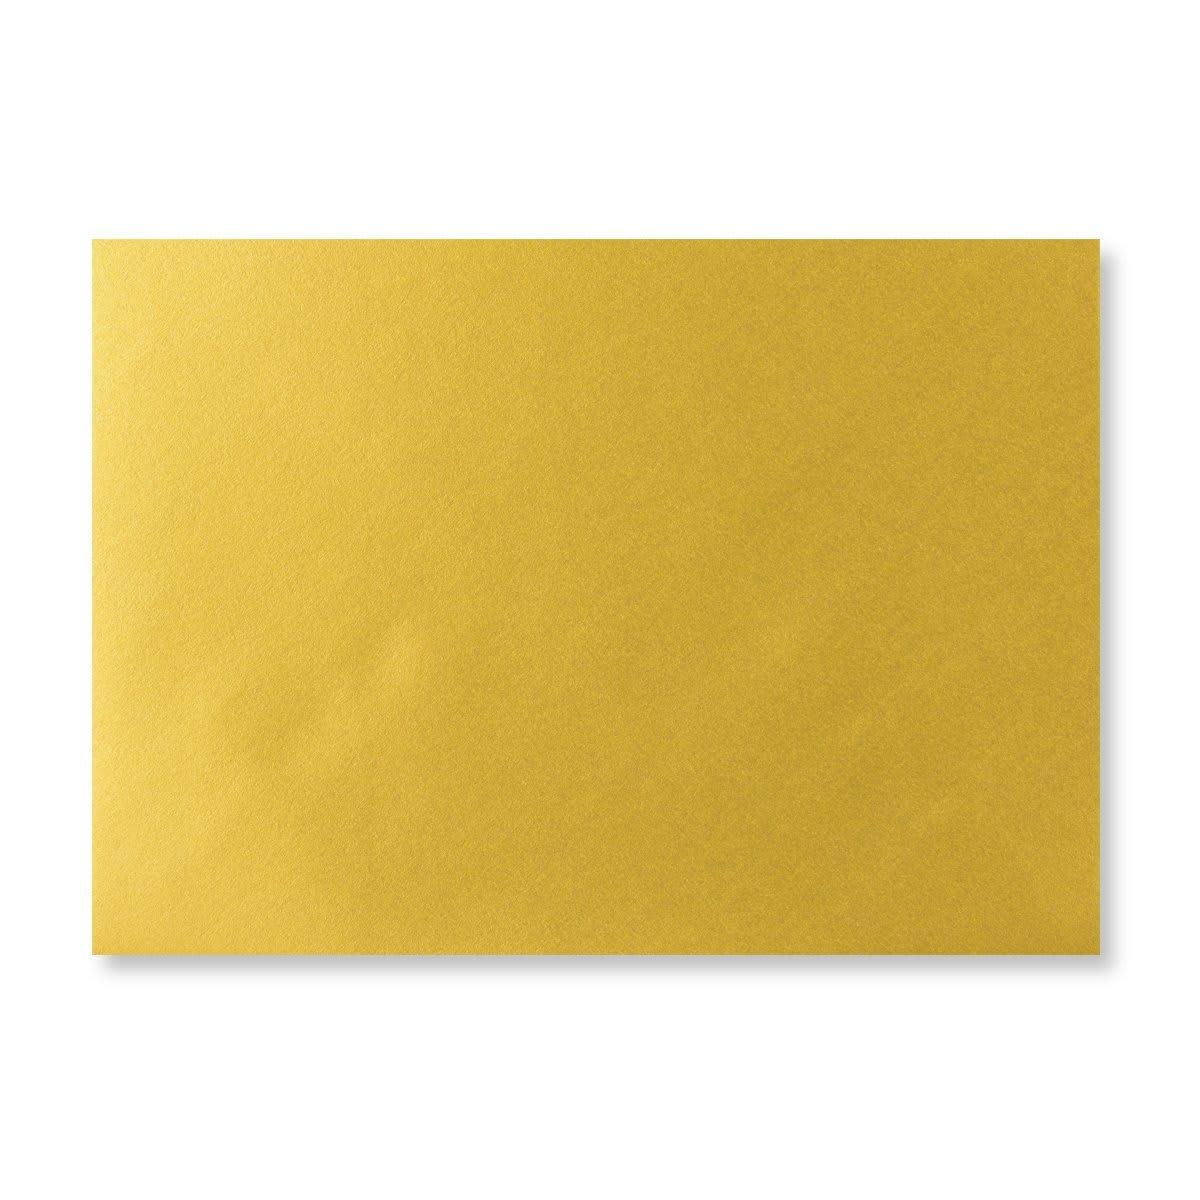 METALLIC GOLD 125 x 175 mm ENVELOPES (i6)